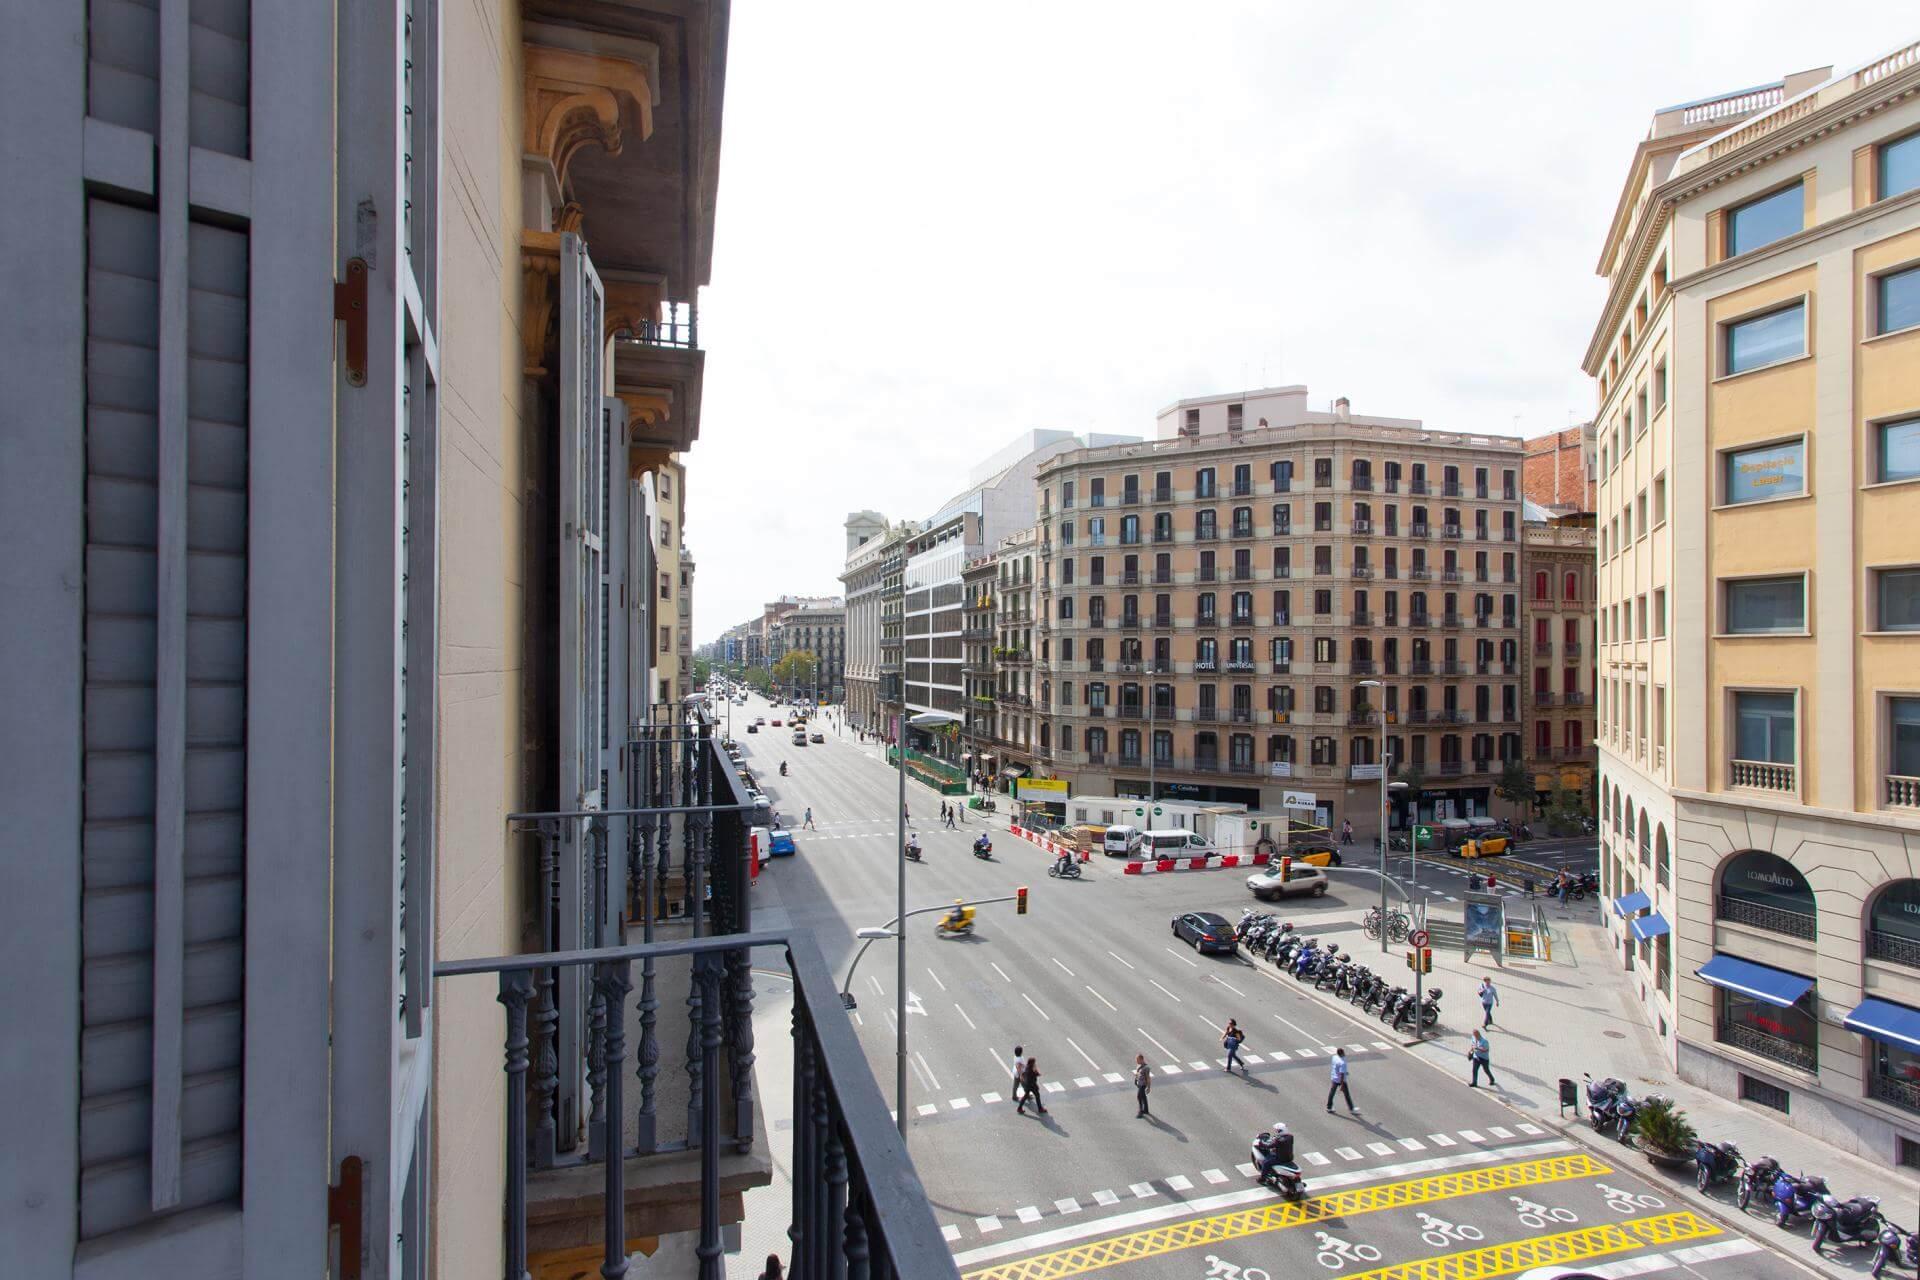 Piso en alojamientos tur sticos barcelona l 39 eixample arago pau claris - Piso turistico barcelona ...